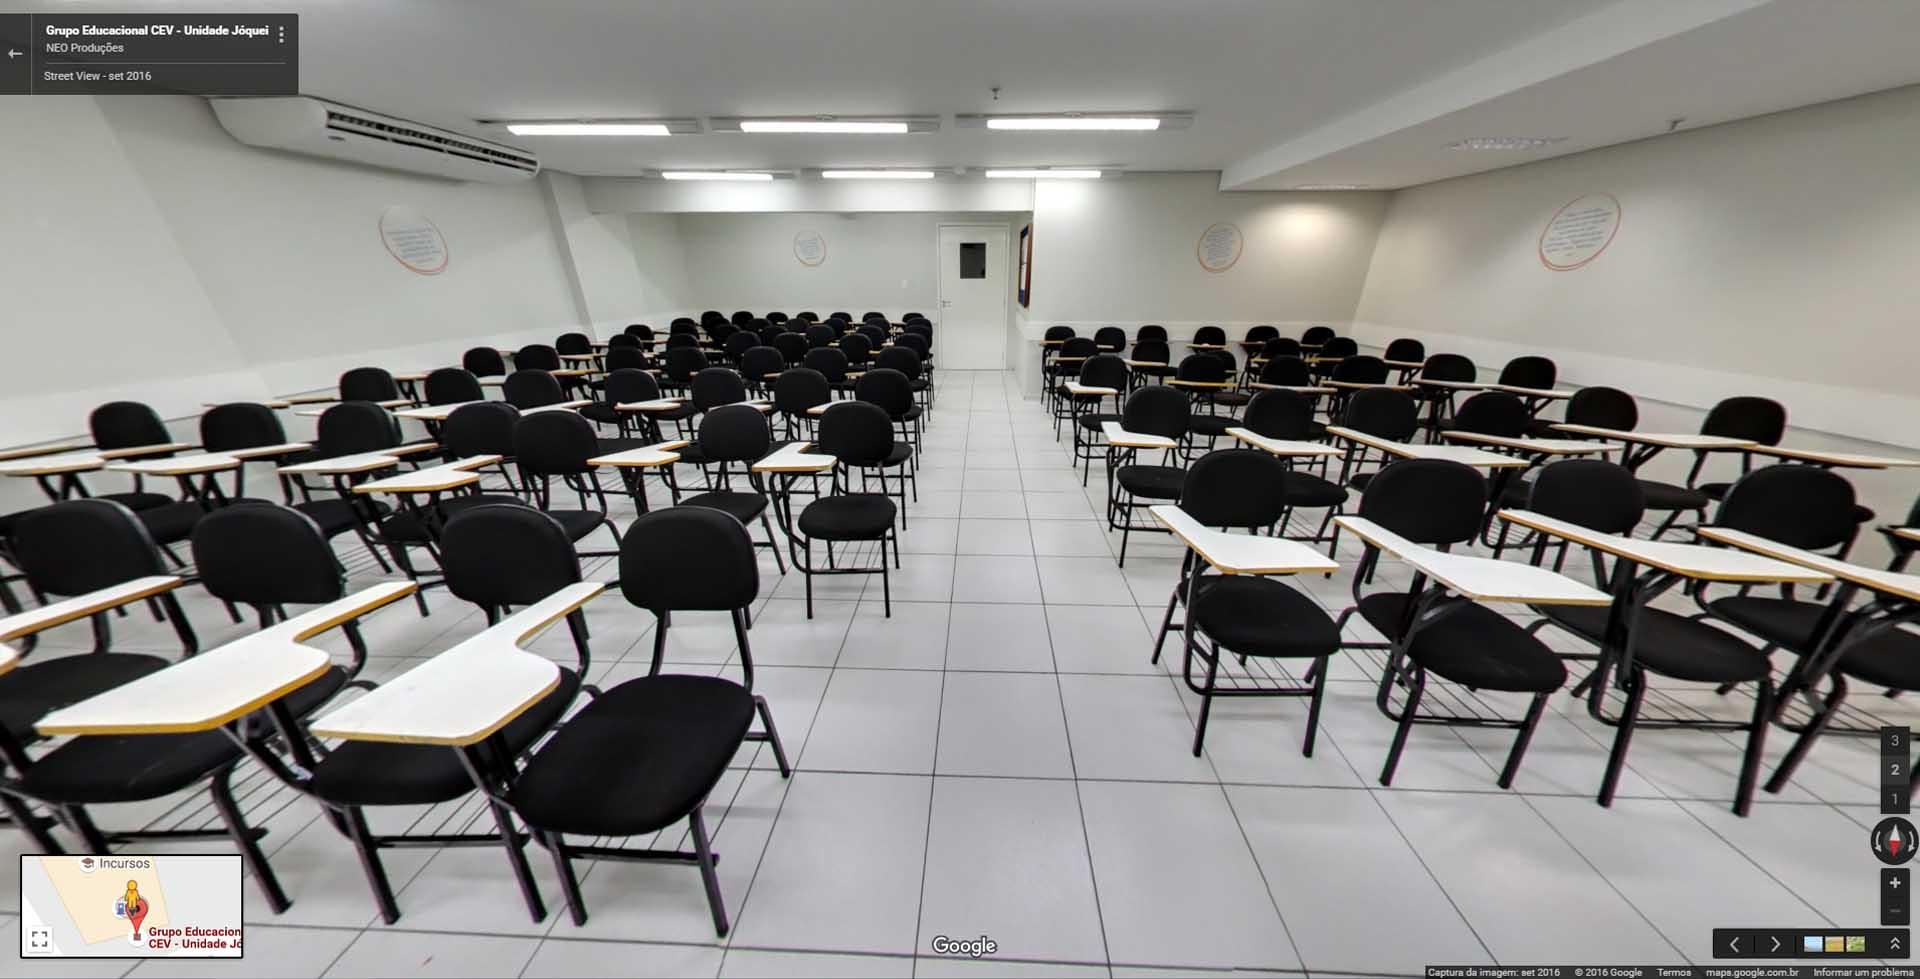 Grupo Educacional CEV - Jóquei